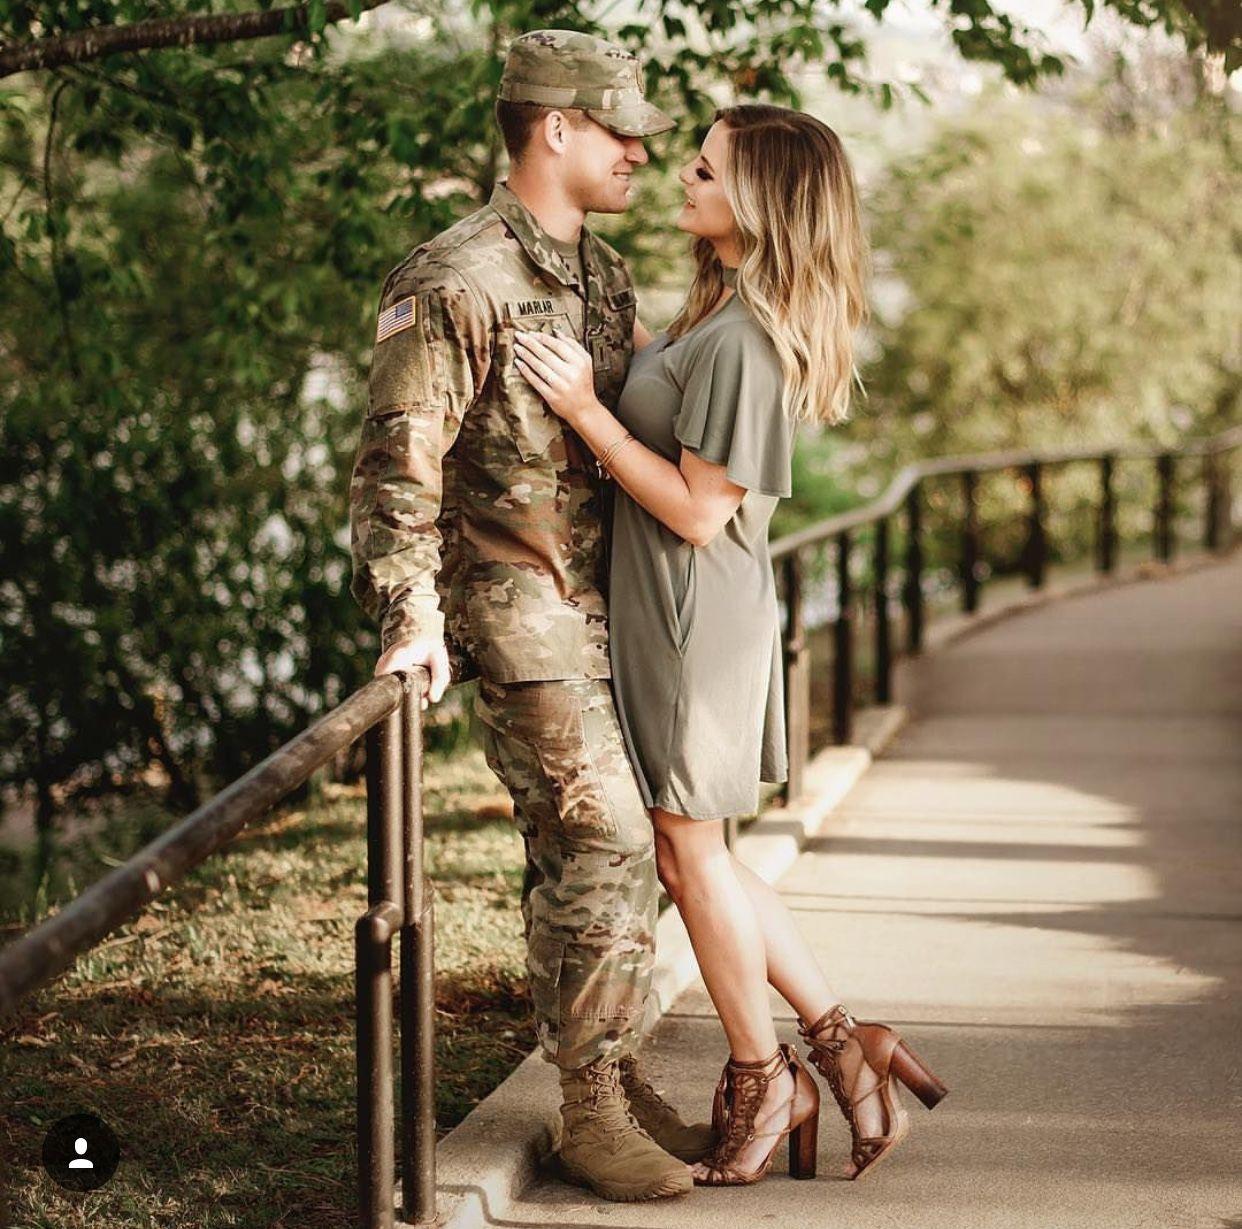 Армия картинки любовь